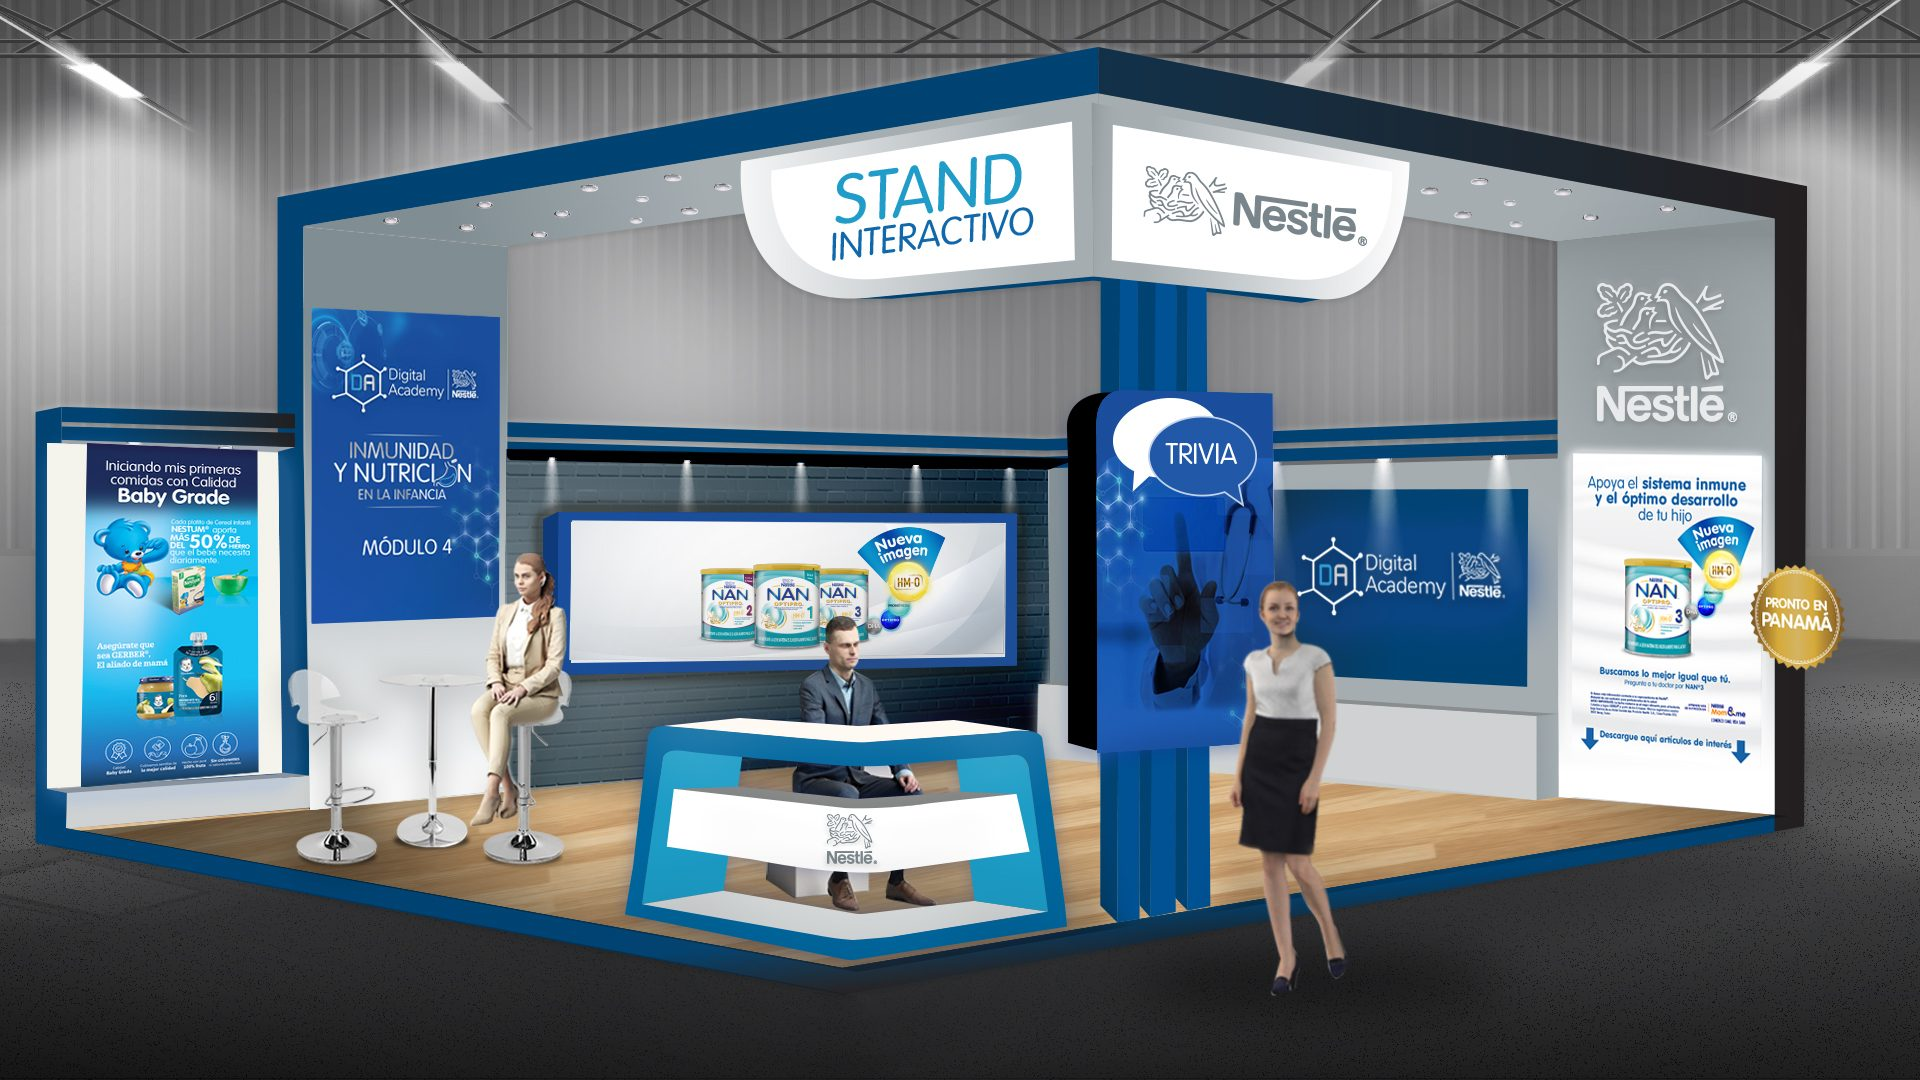 Stand-Virtual-NestleACADEMY-modulo4-1920x1080